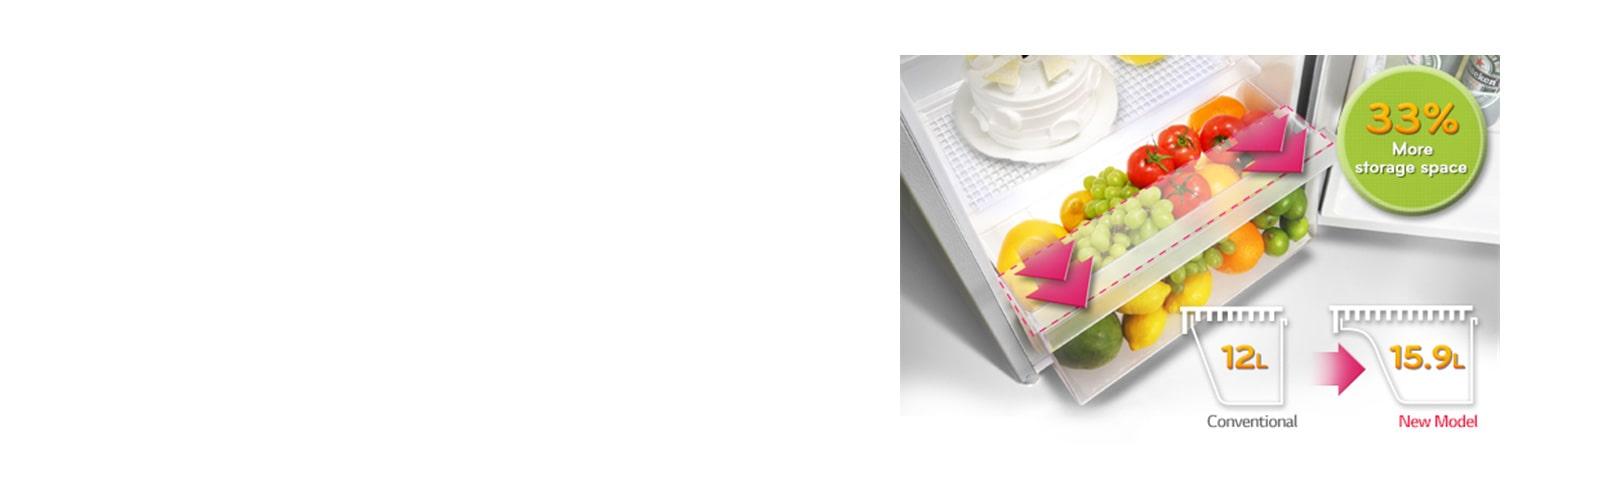 GN-Y331SLB_All_Refrigerators_large-Vegetable-box_D